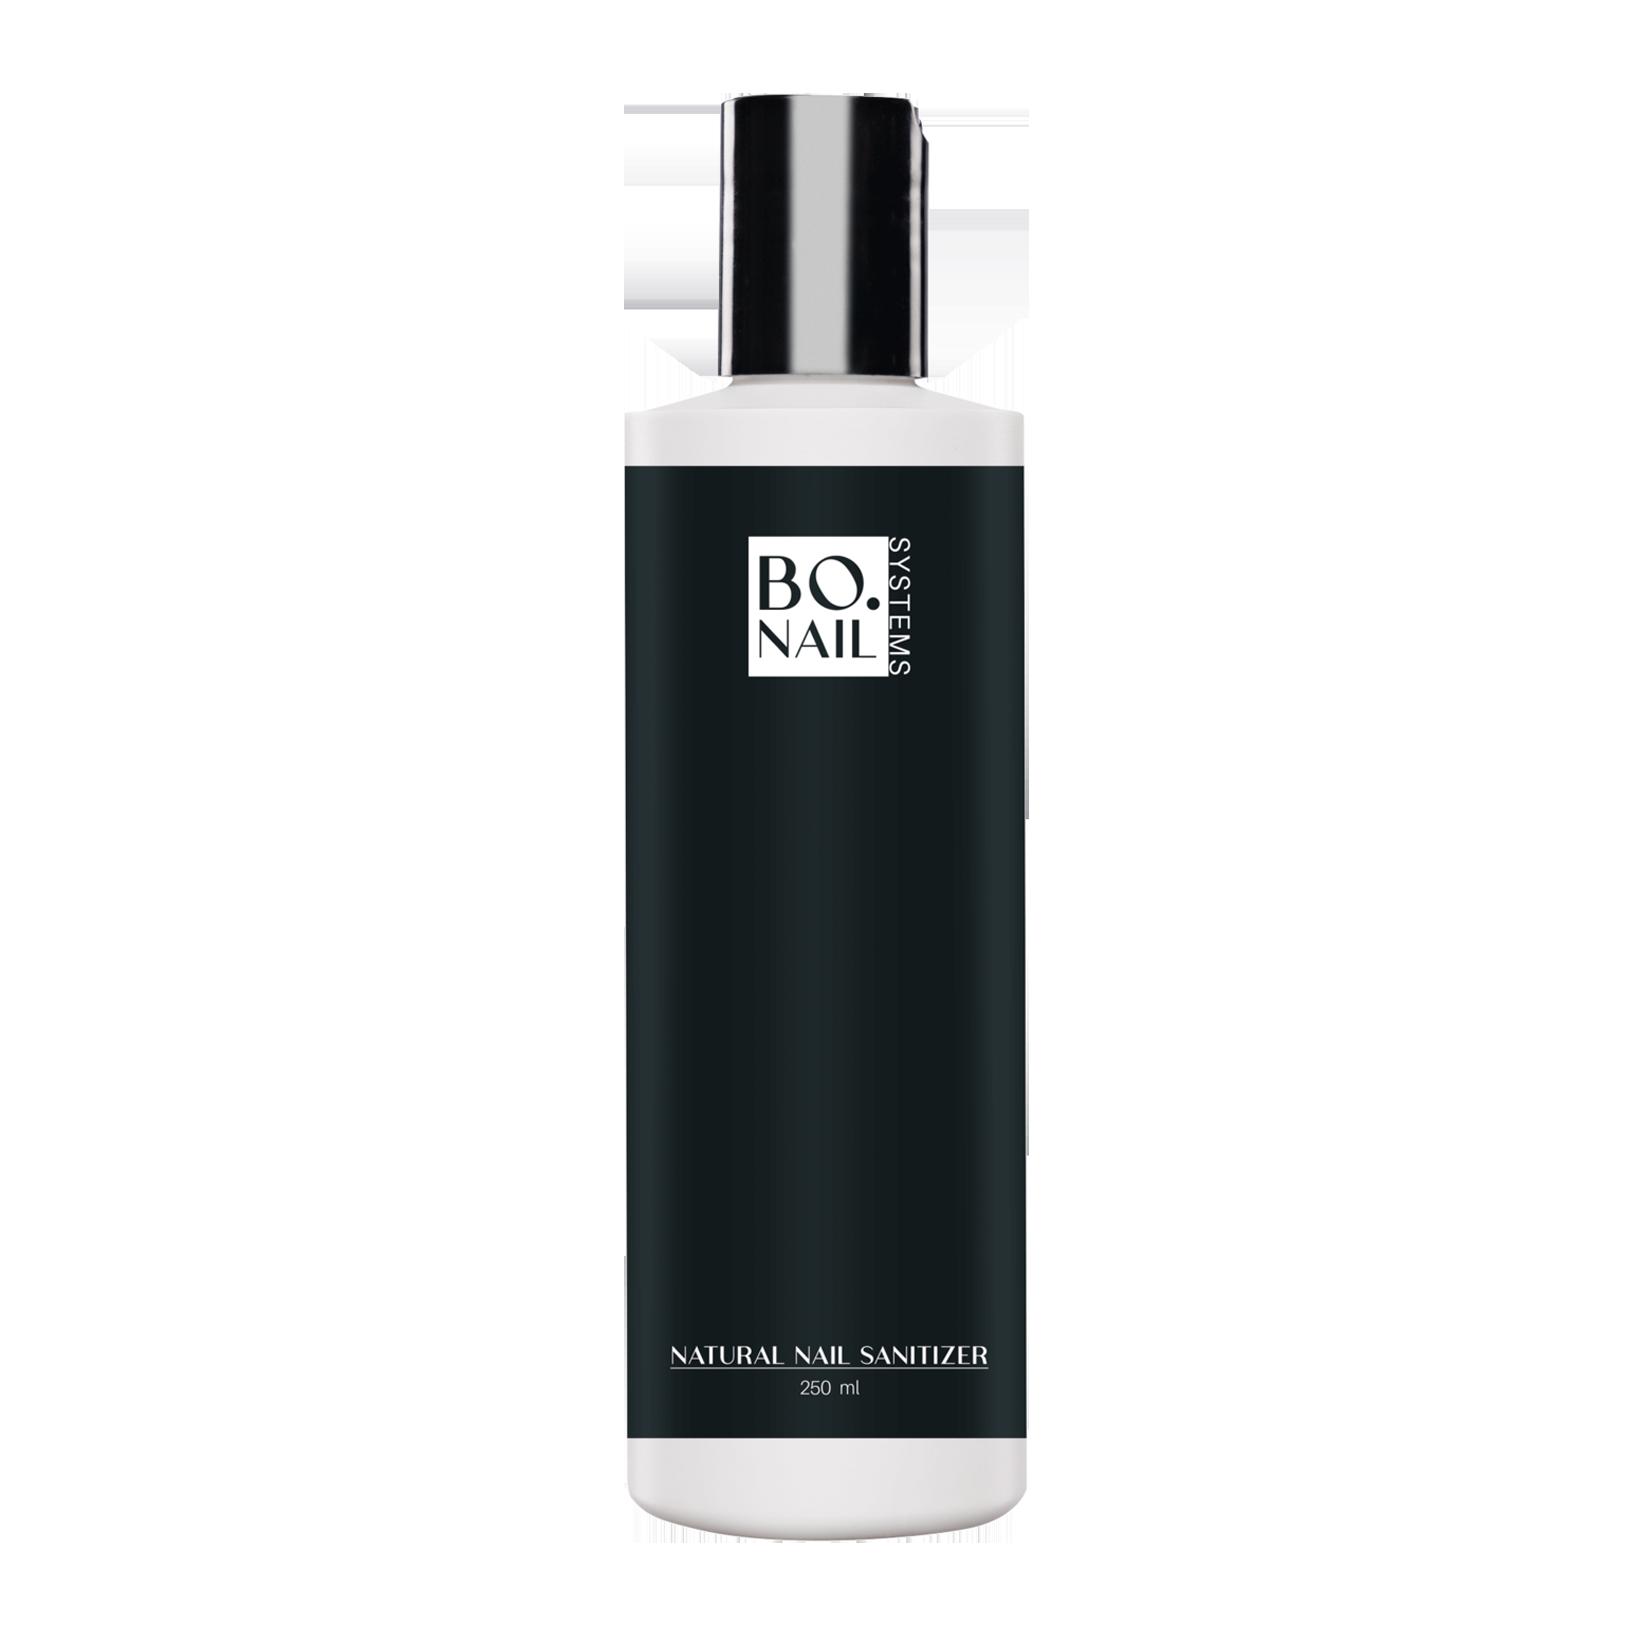 BO Natural Nail Sanitizer 250ml